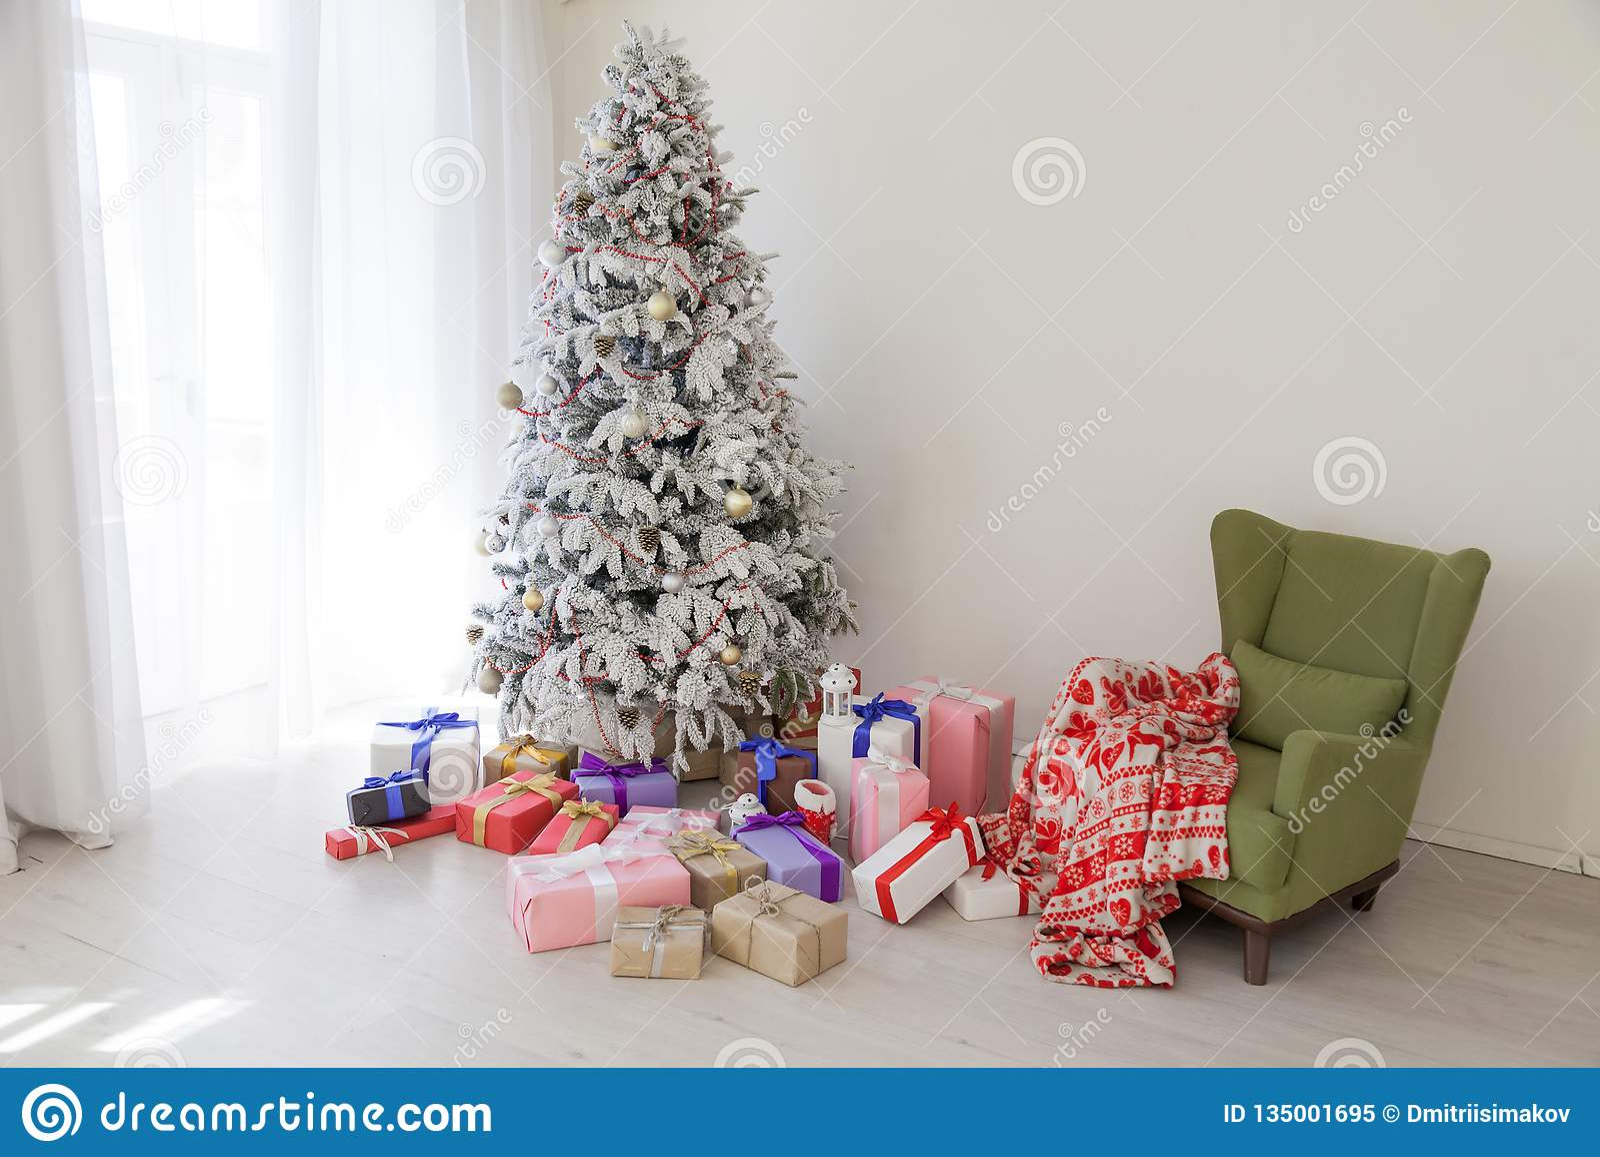 white house christmas tree 2020